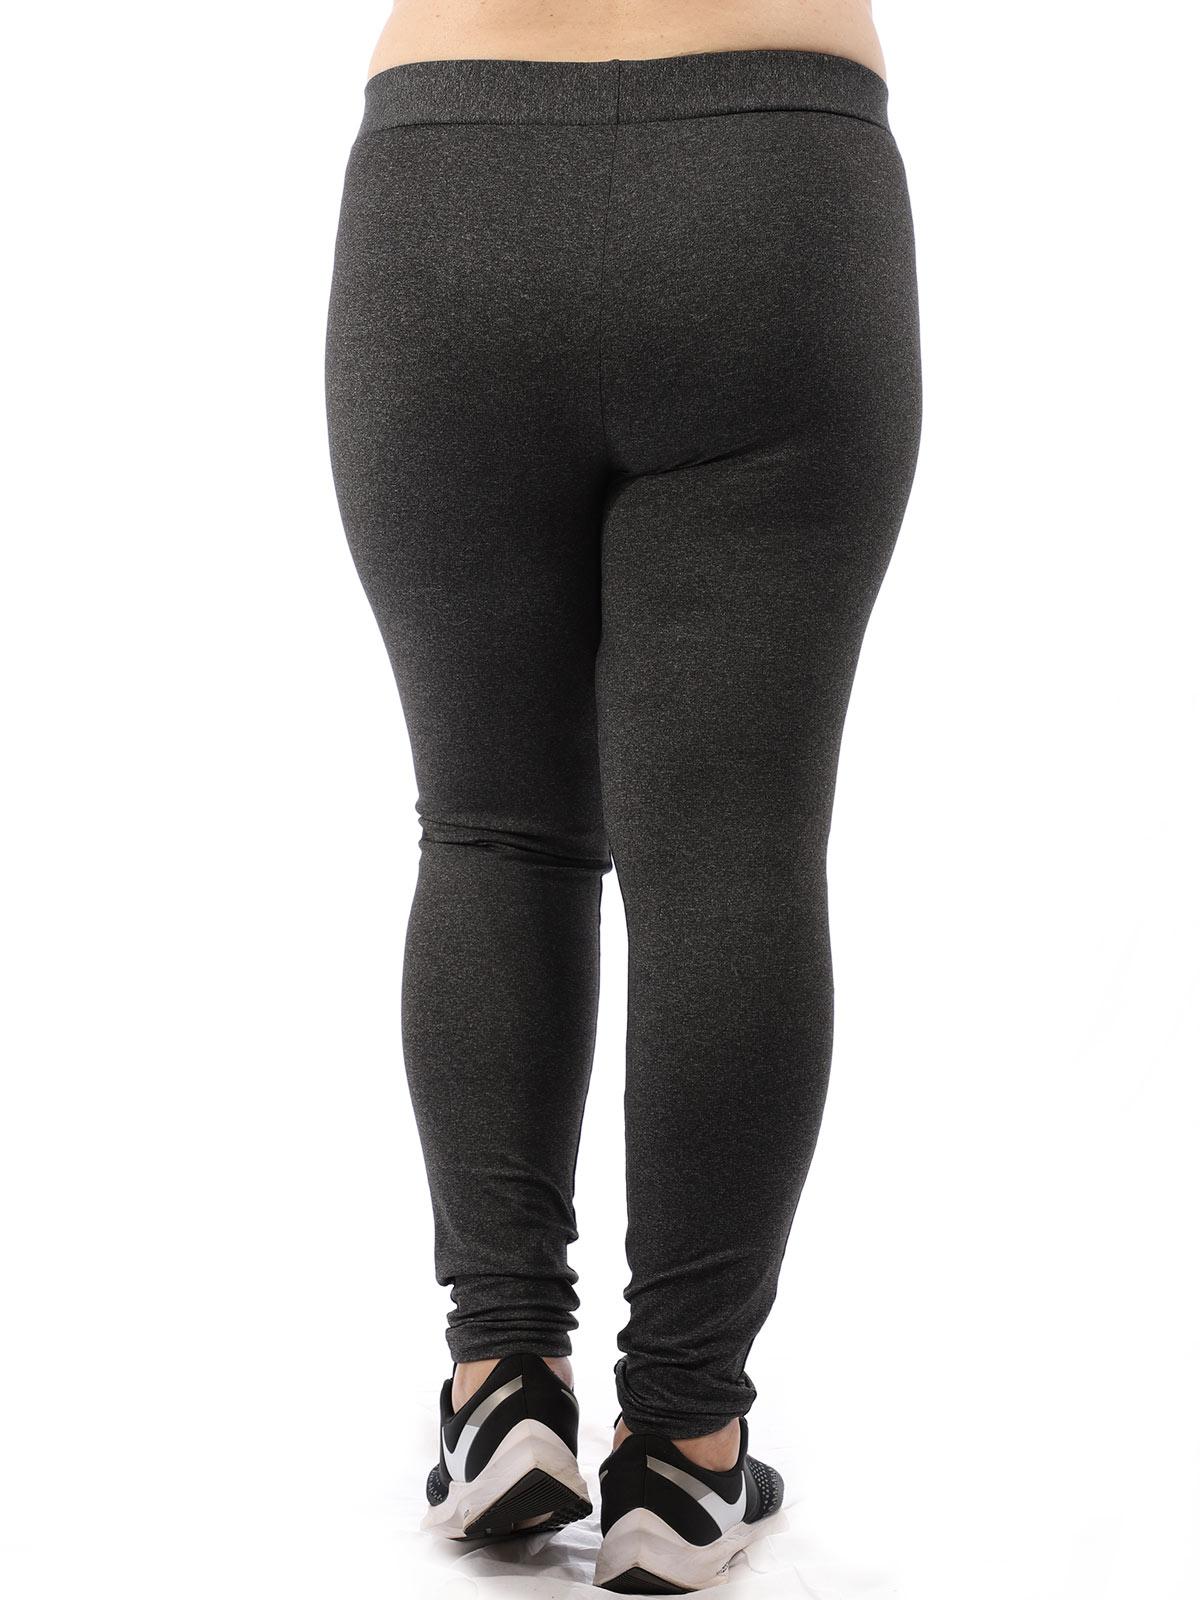 Calça Plus Size Feminina Legging Fitness Grossa Mescla Preto